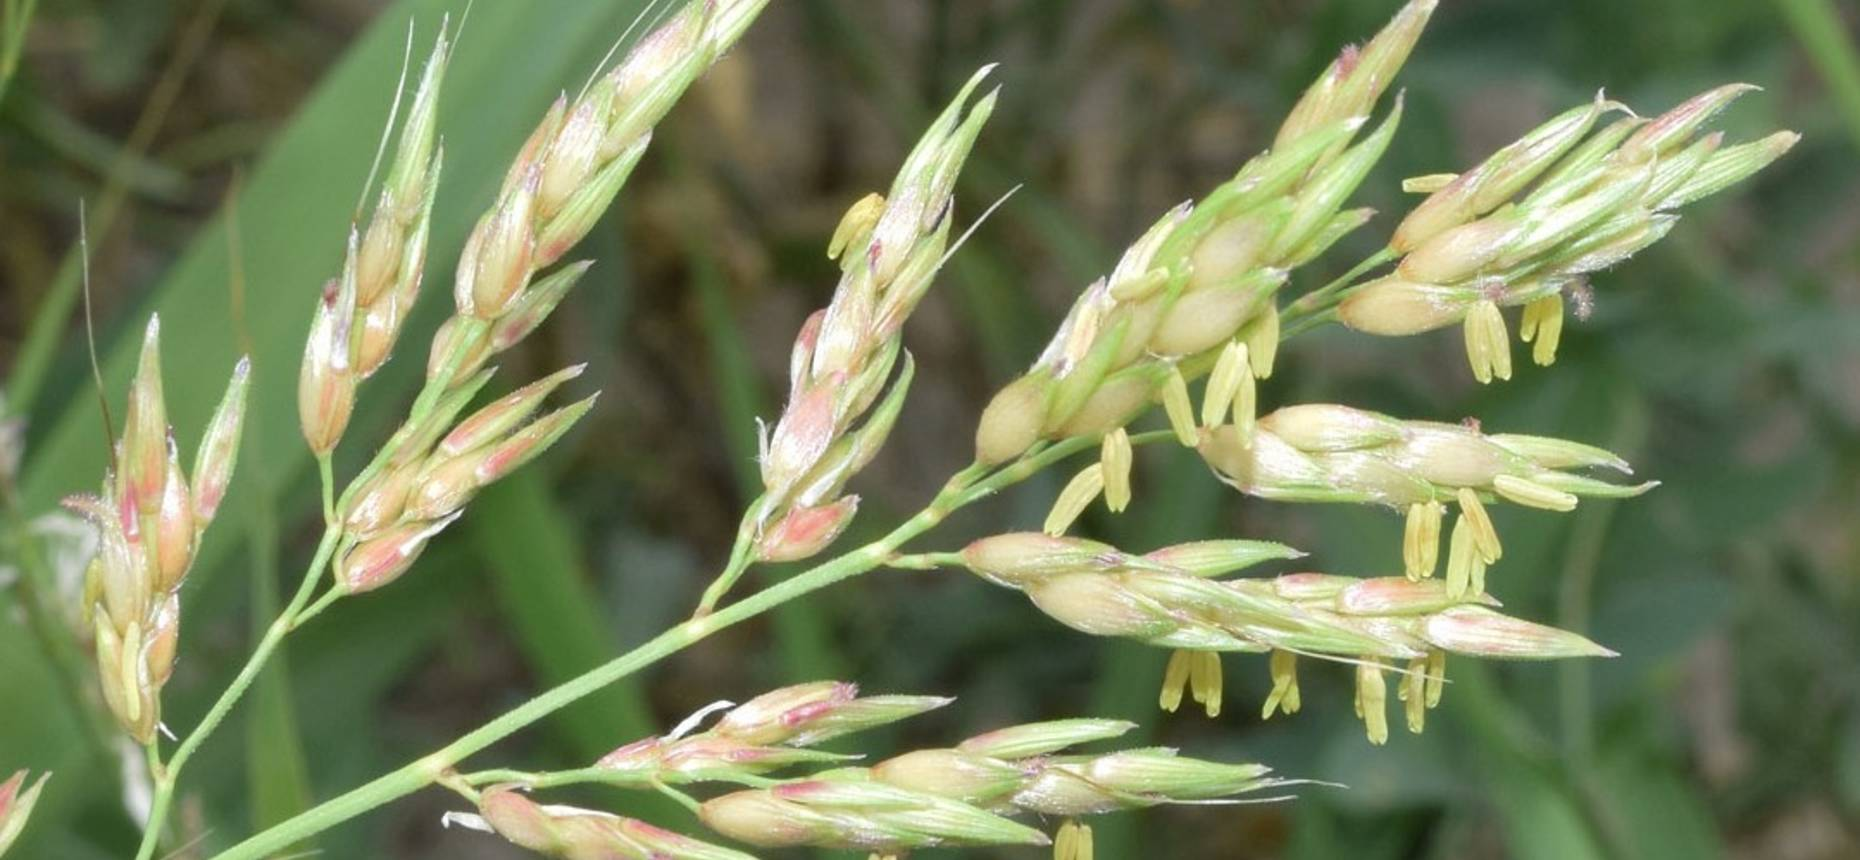 Sorghum halepense (L.) Pers. - Сорго алеппское, Джонсова трава, Гумай